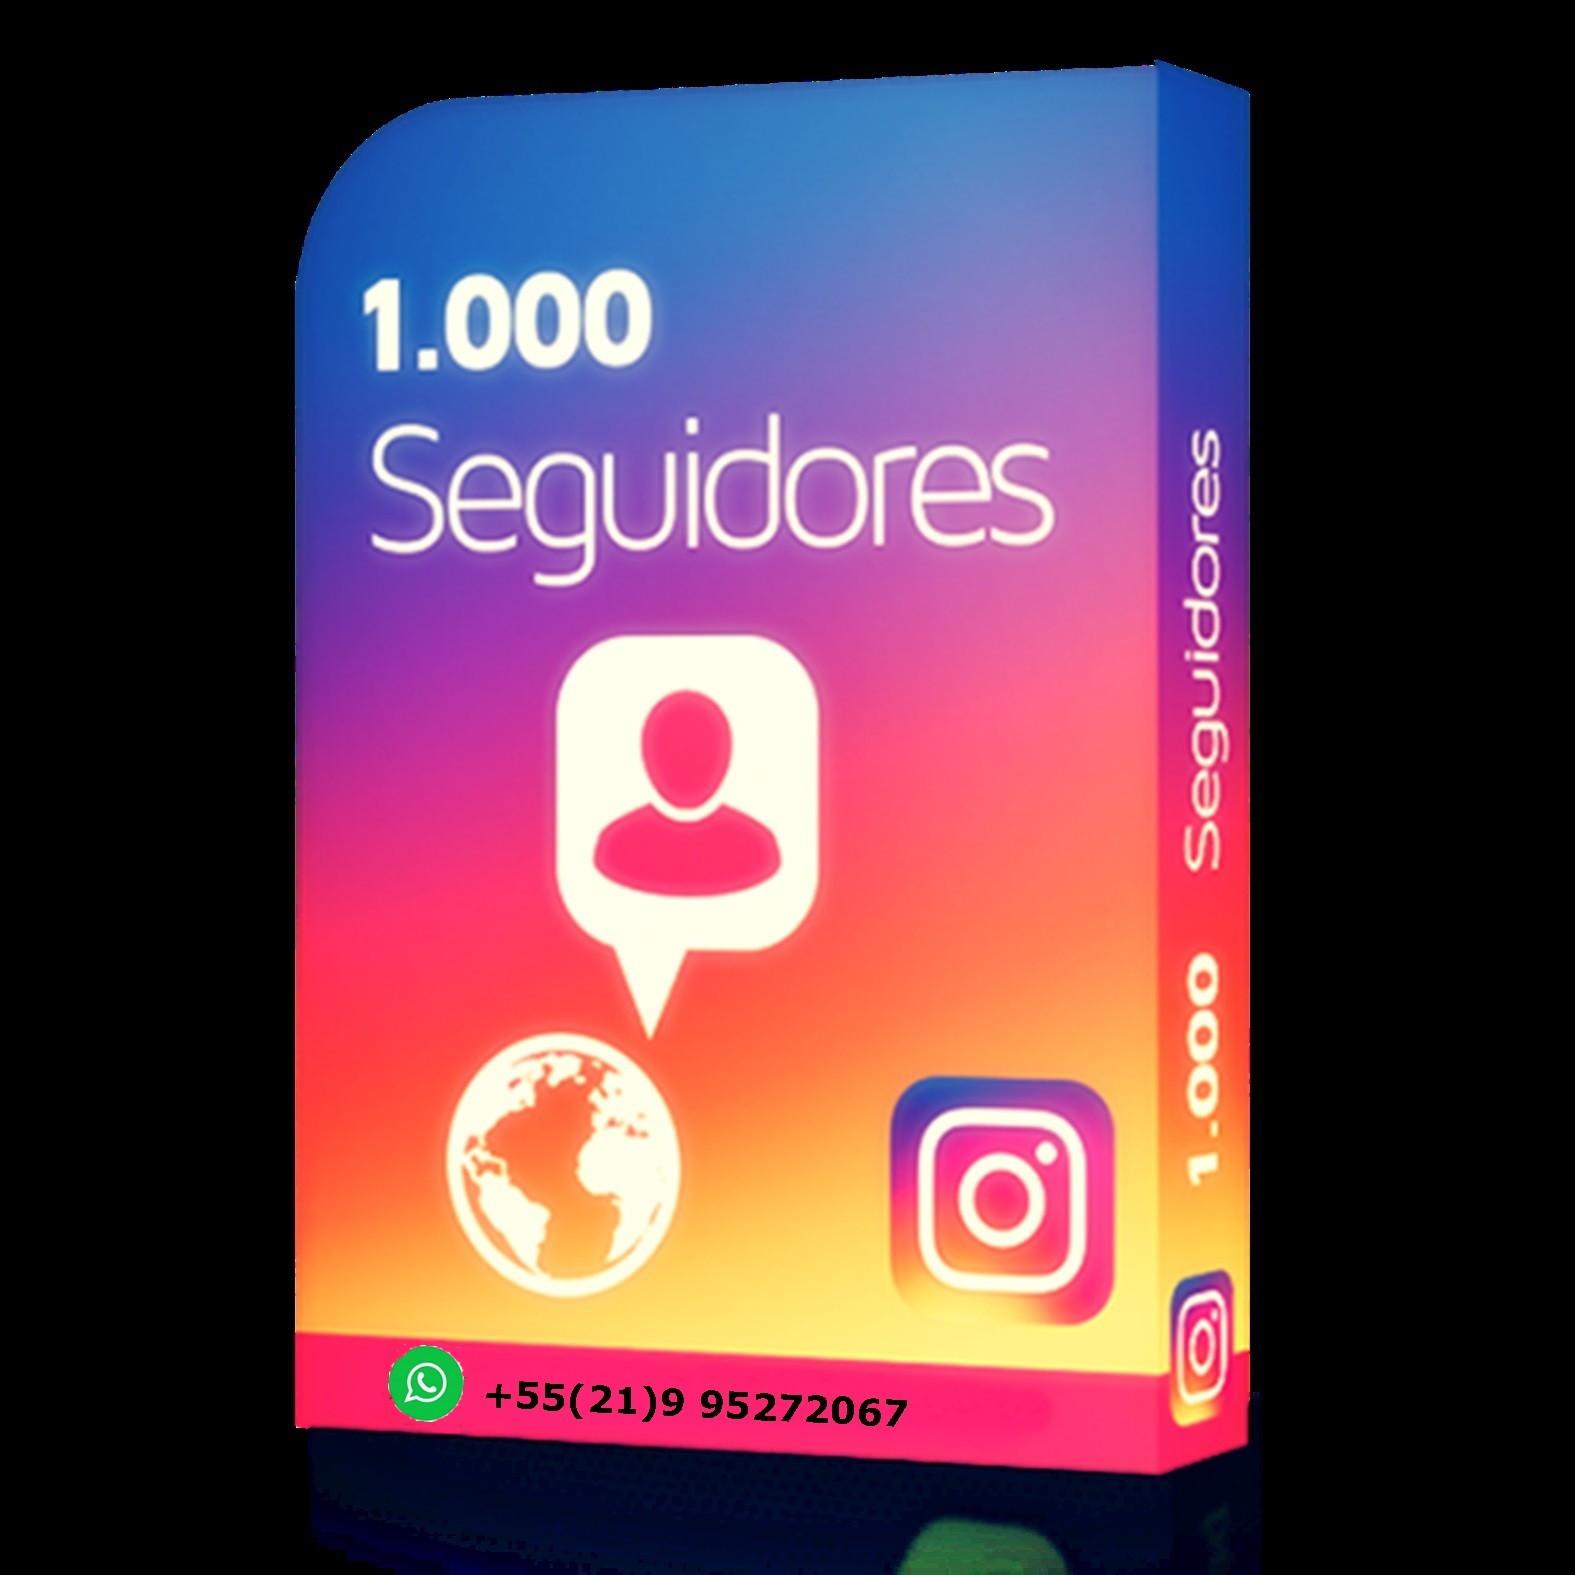 comprar seguidores instagram empresa